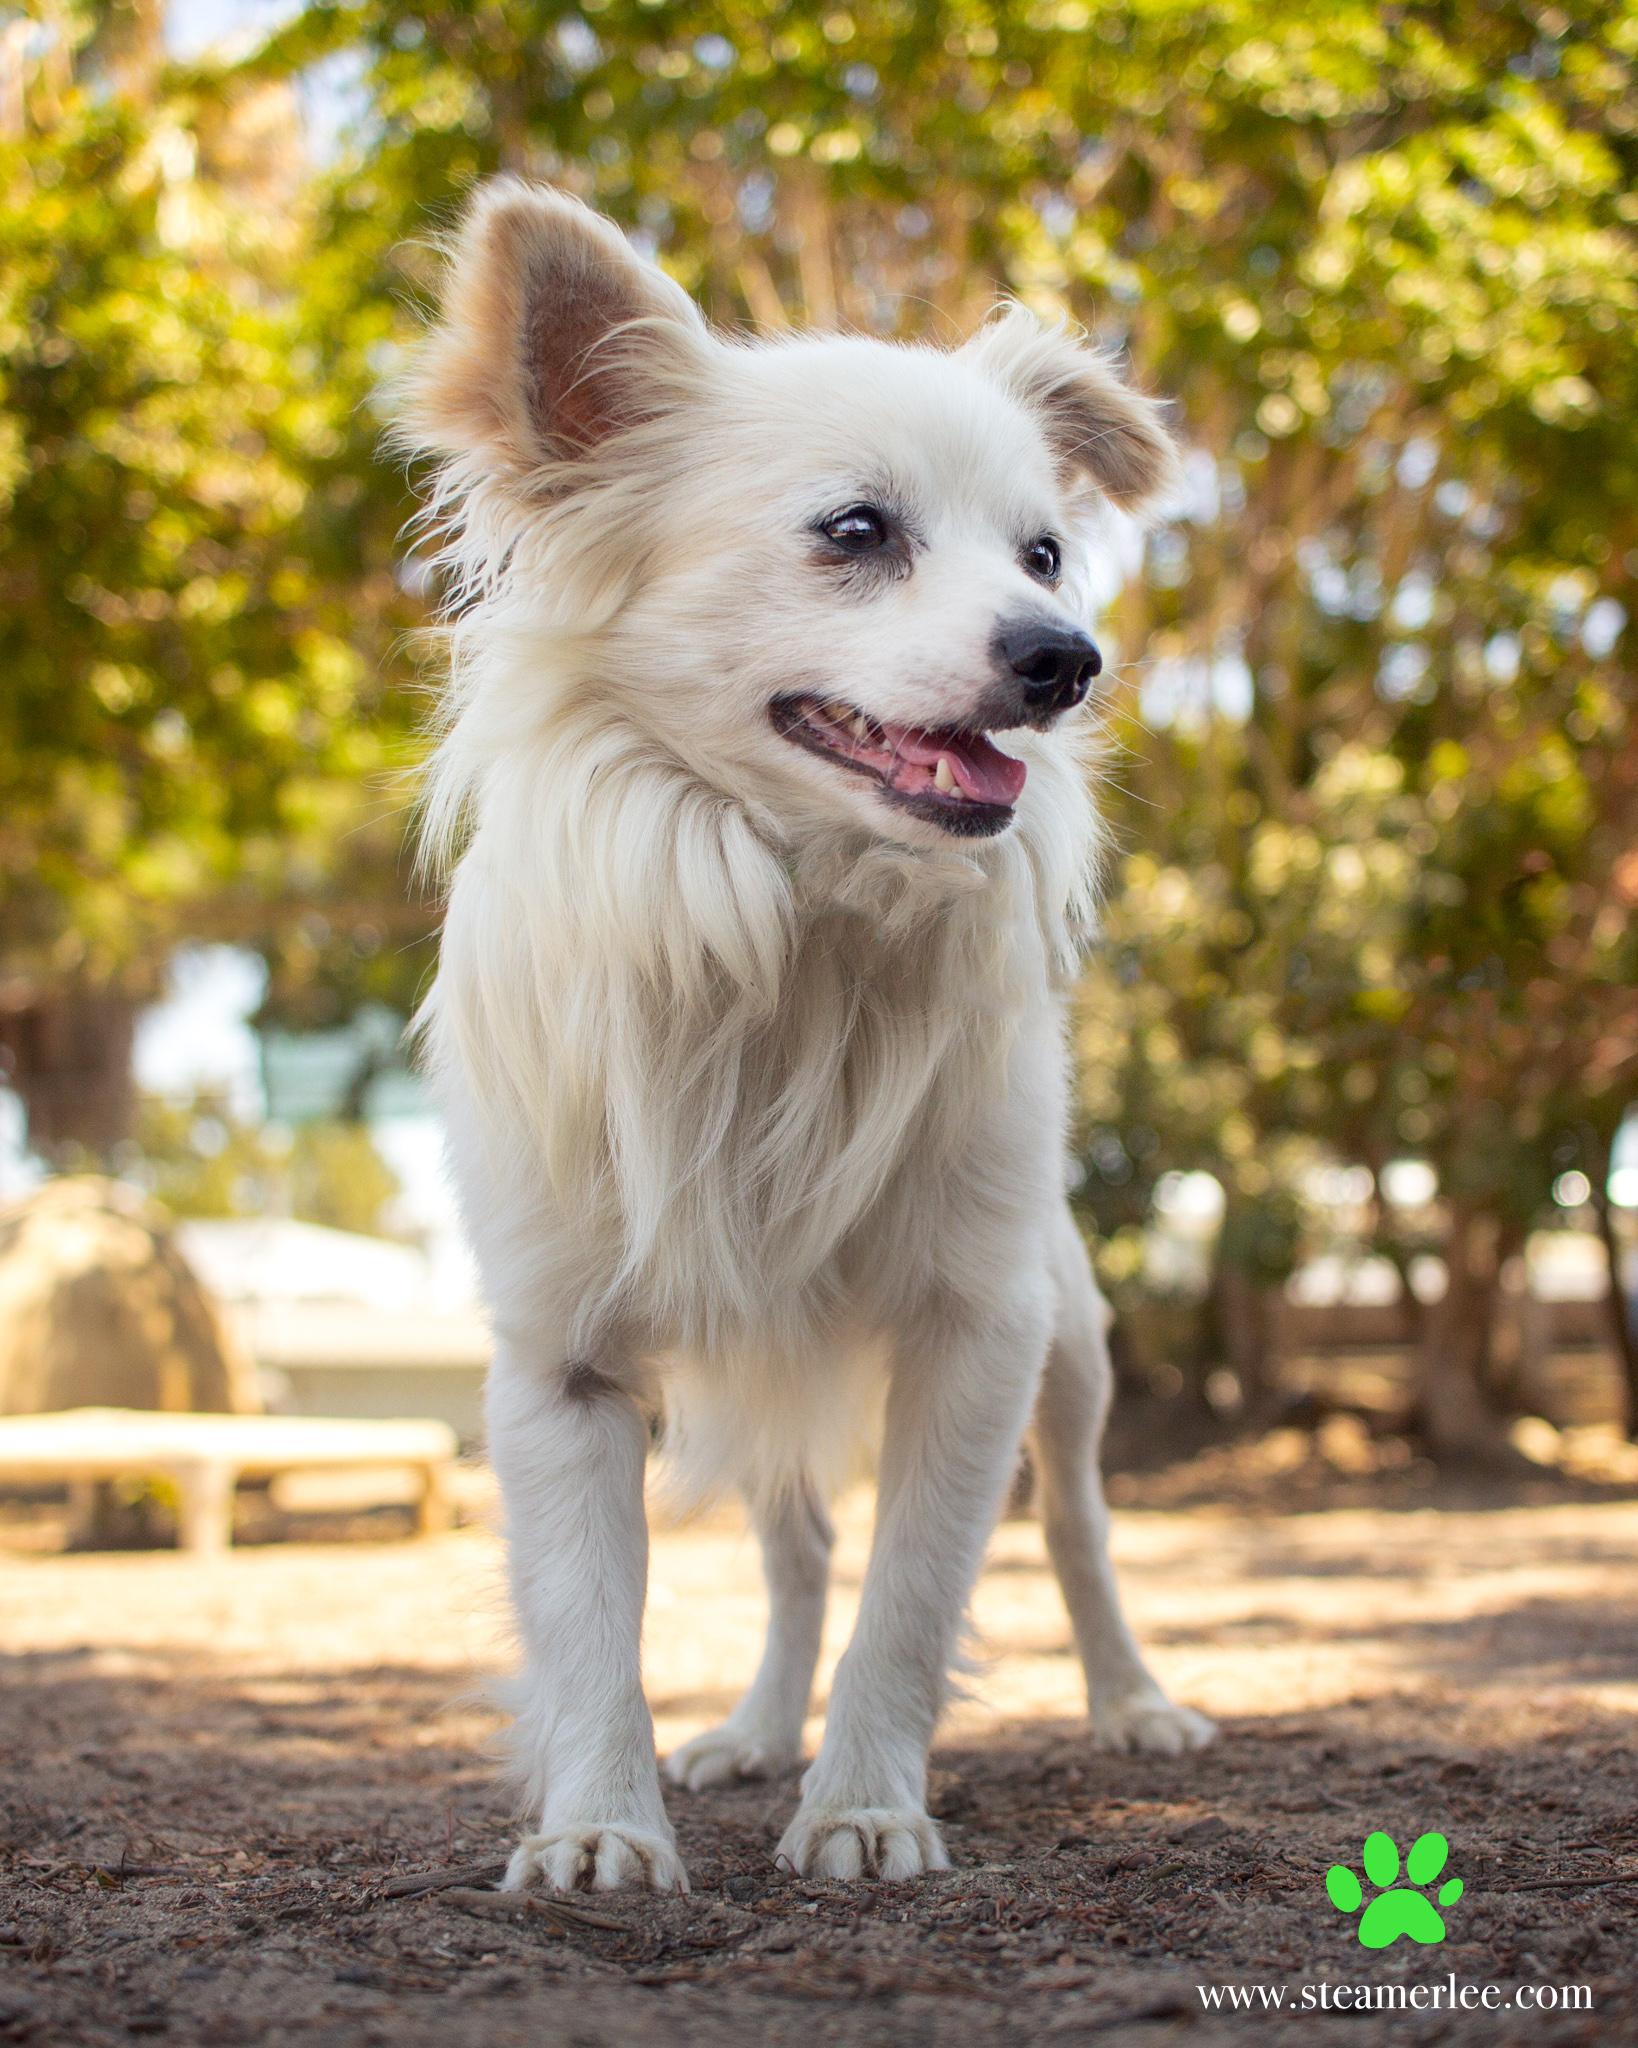 484-Orange-County-Dog-Photography-Steamer-Lee-Southern-California-SBACC.JPG